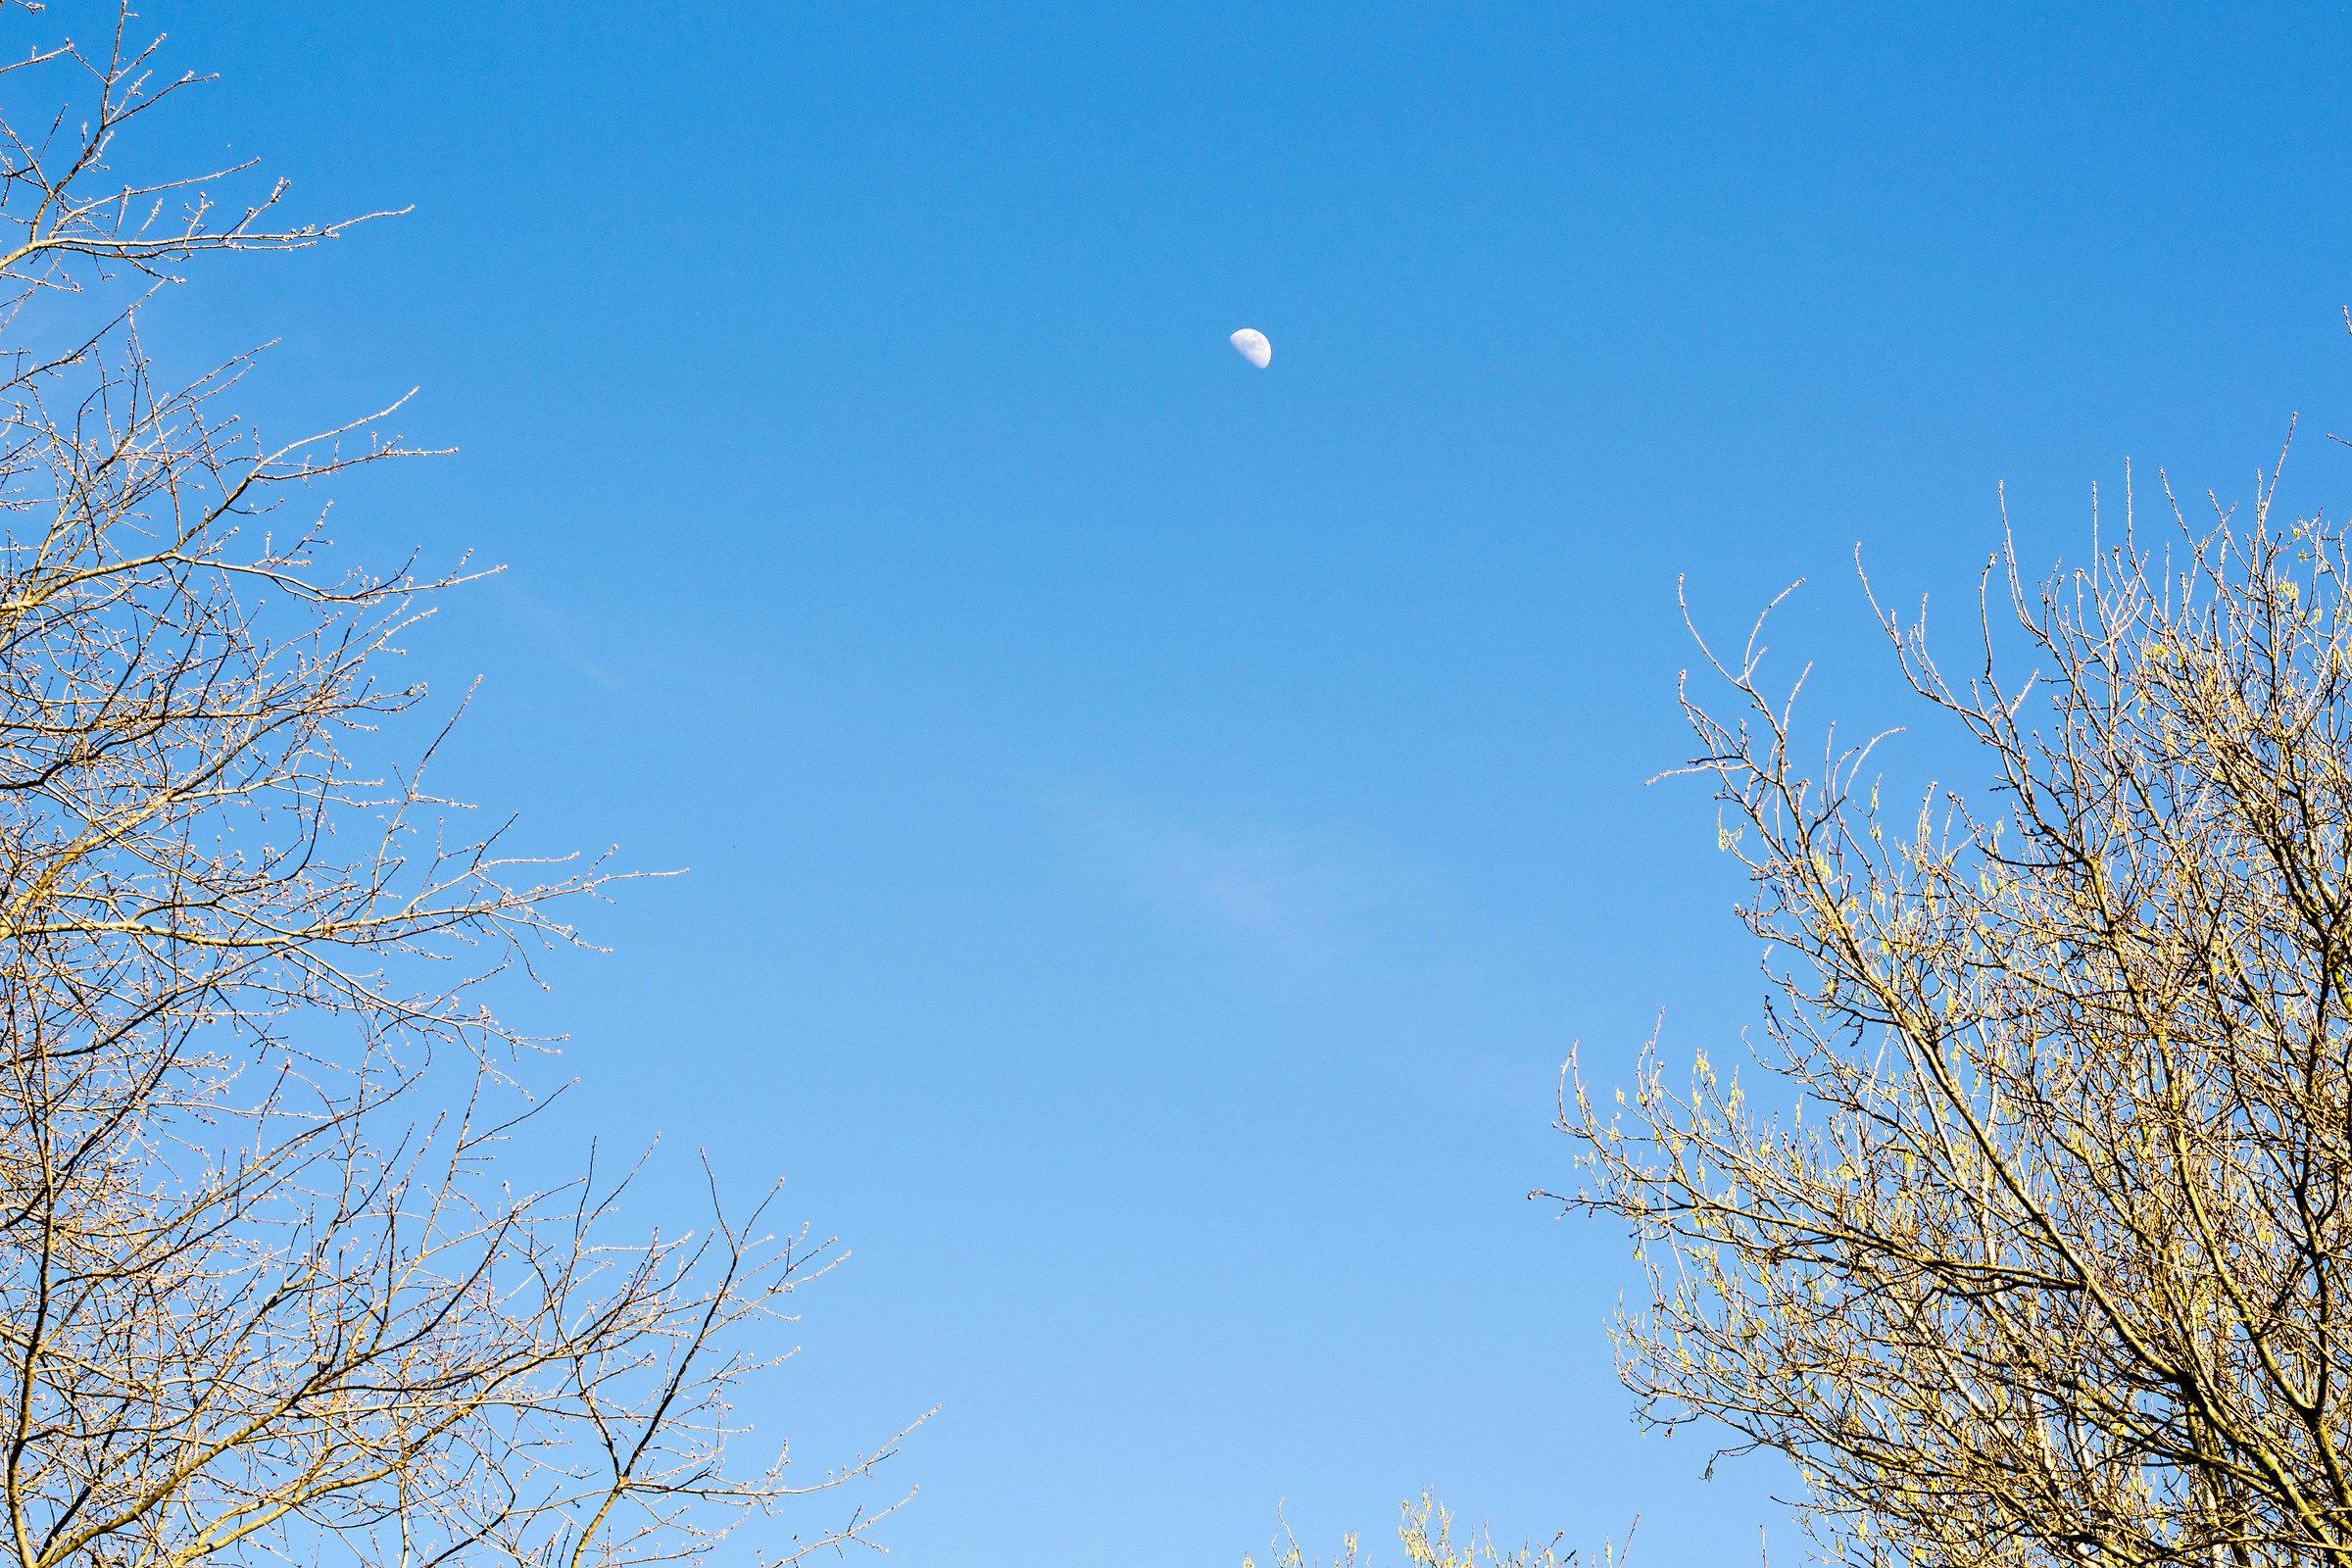 Moon in broad daylight...